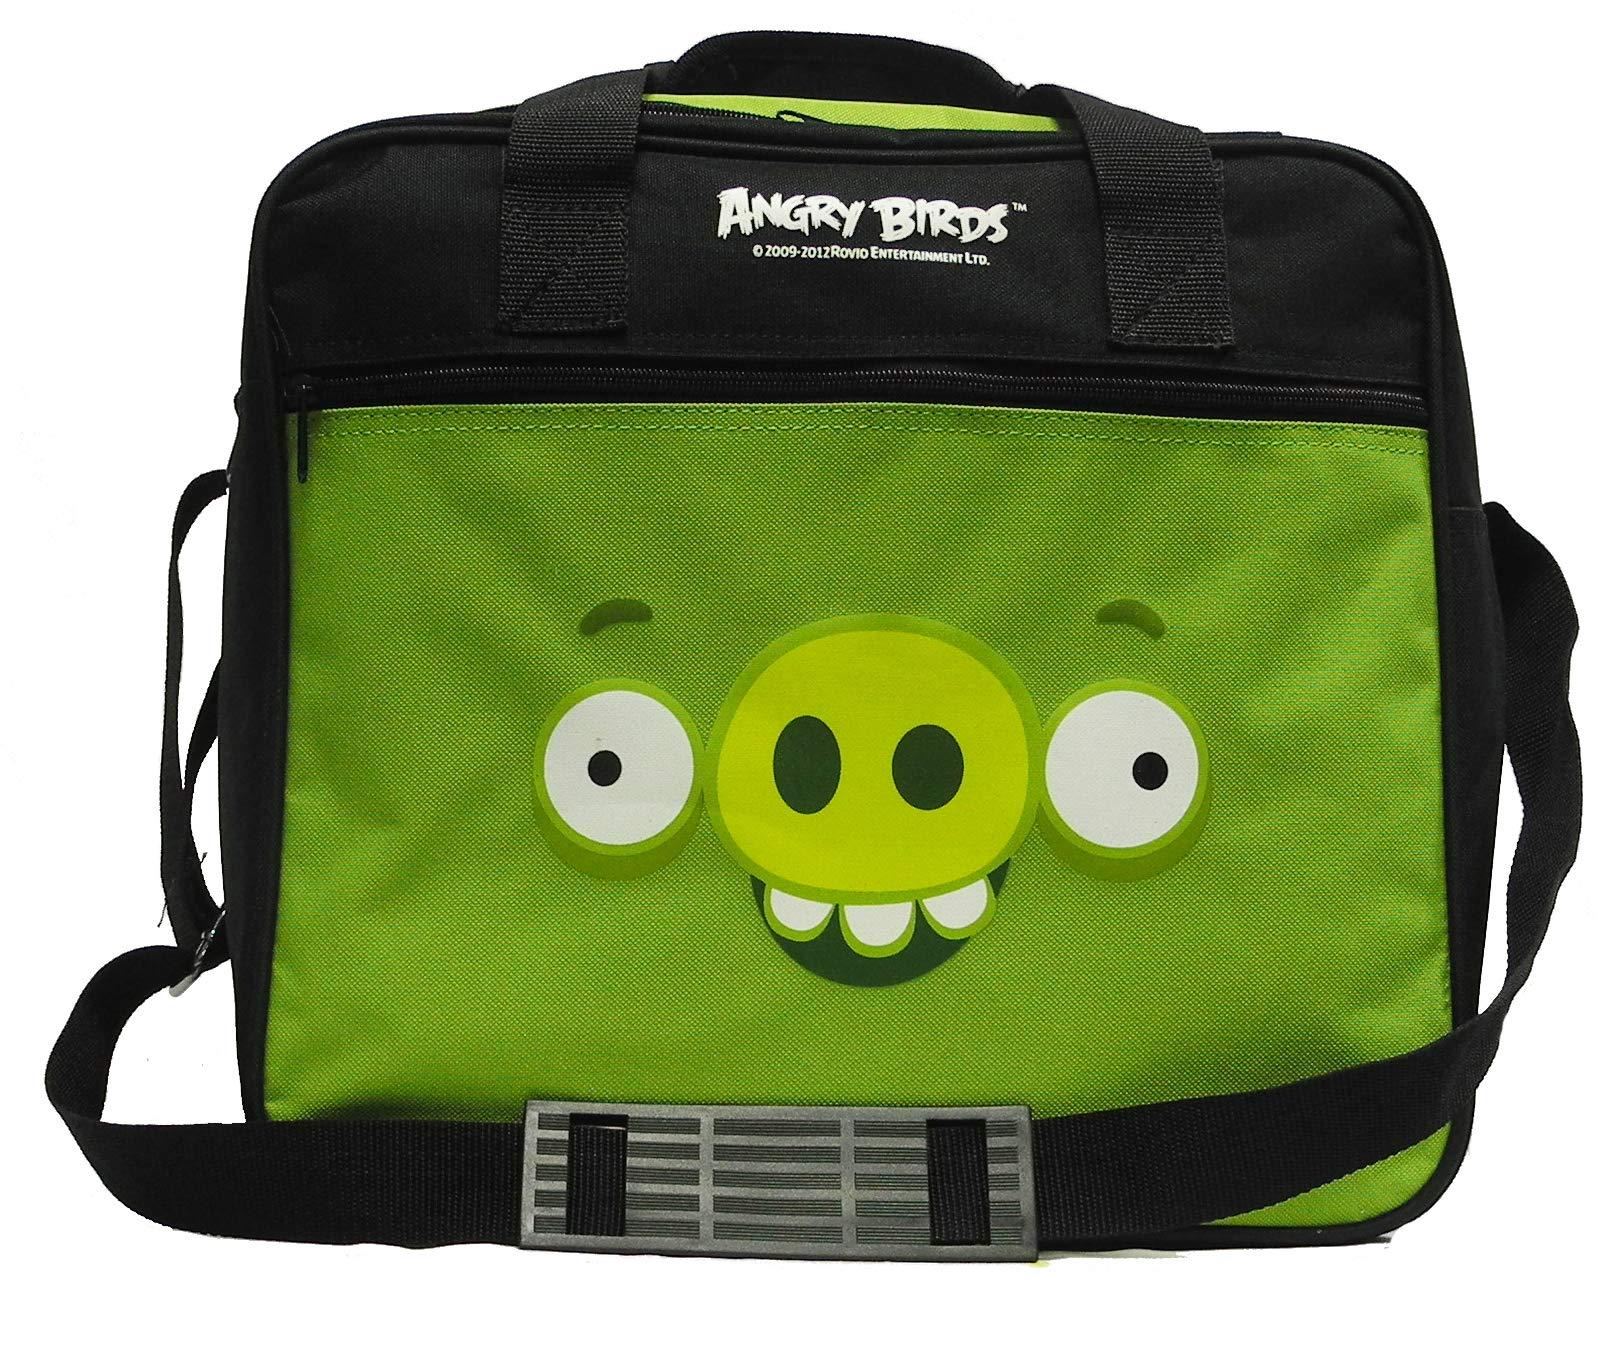 Ebonite Angry Birds Single Ball Deluxe Bowling Bag (Green Minion Pig) by Ebonite